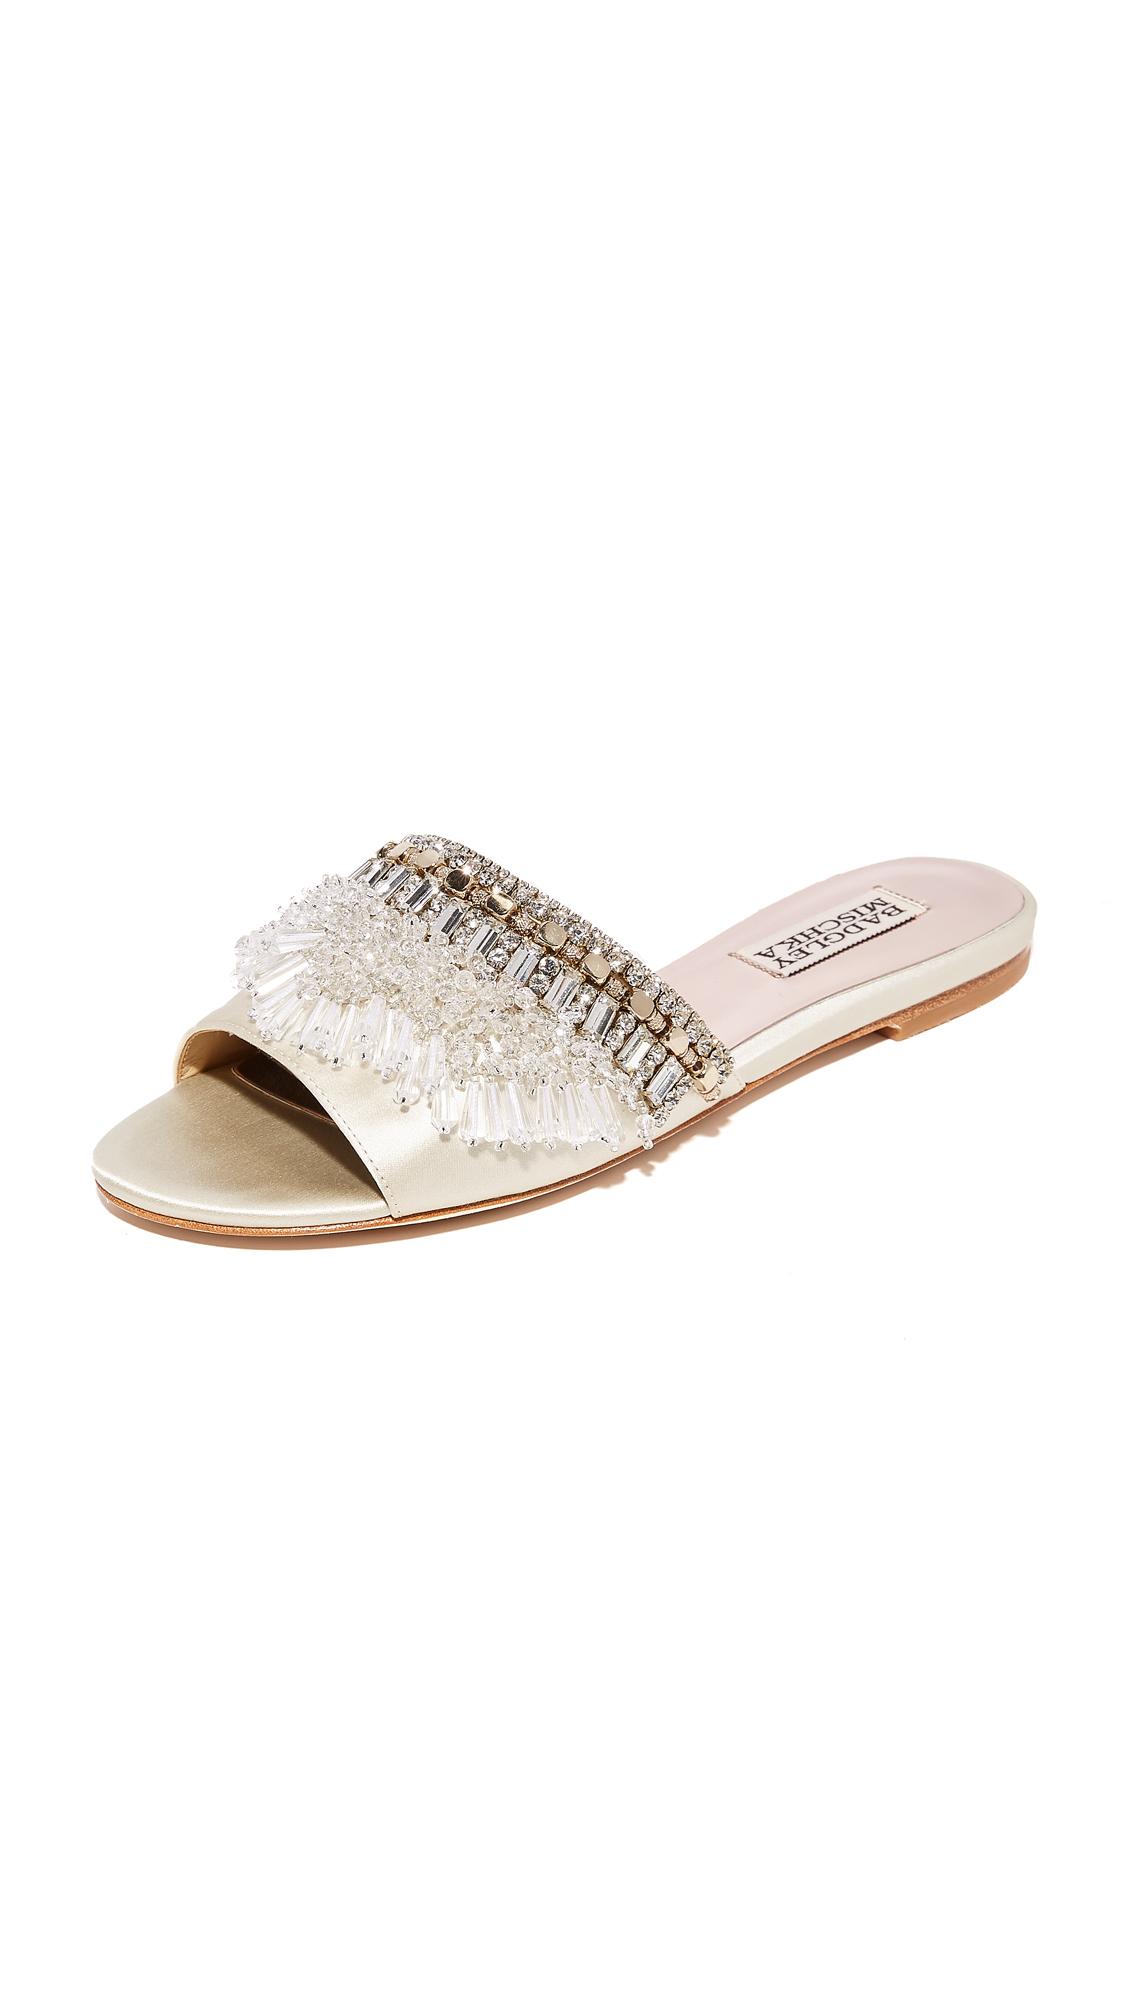 Badgley Mischka Kassandra Embellished Slides - Ivory